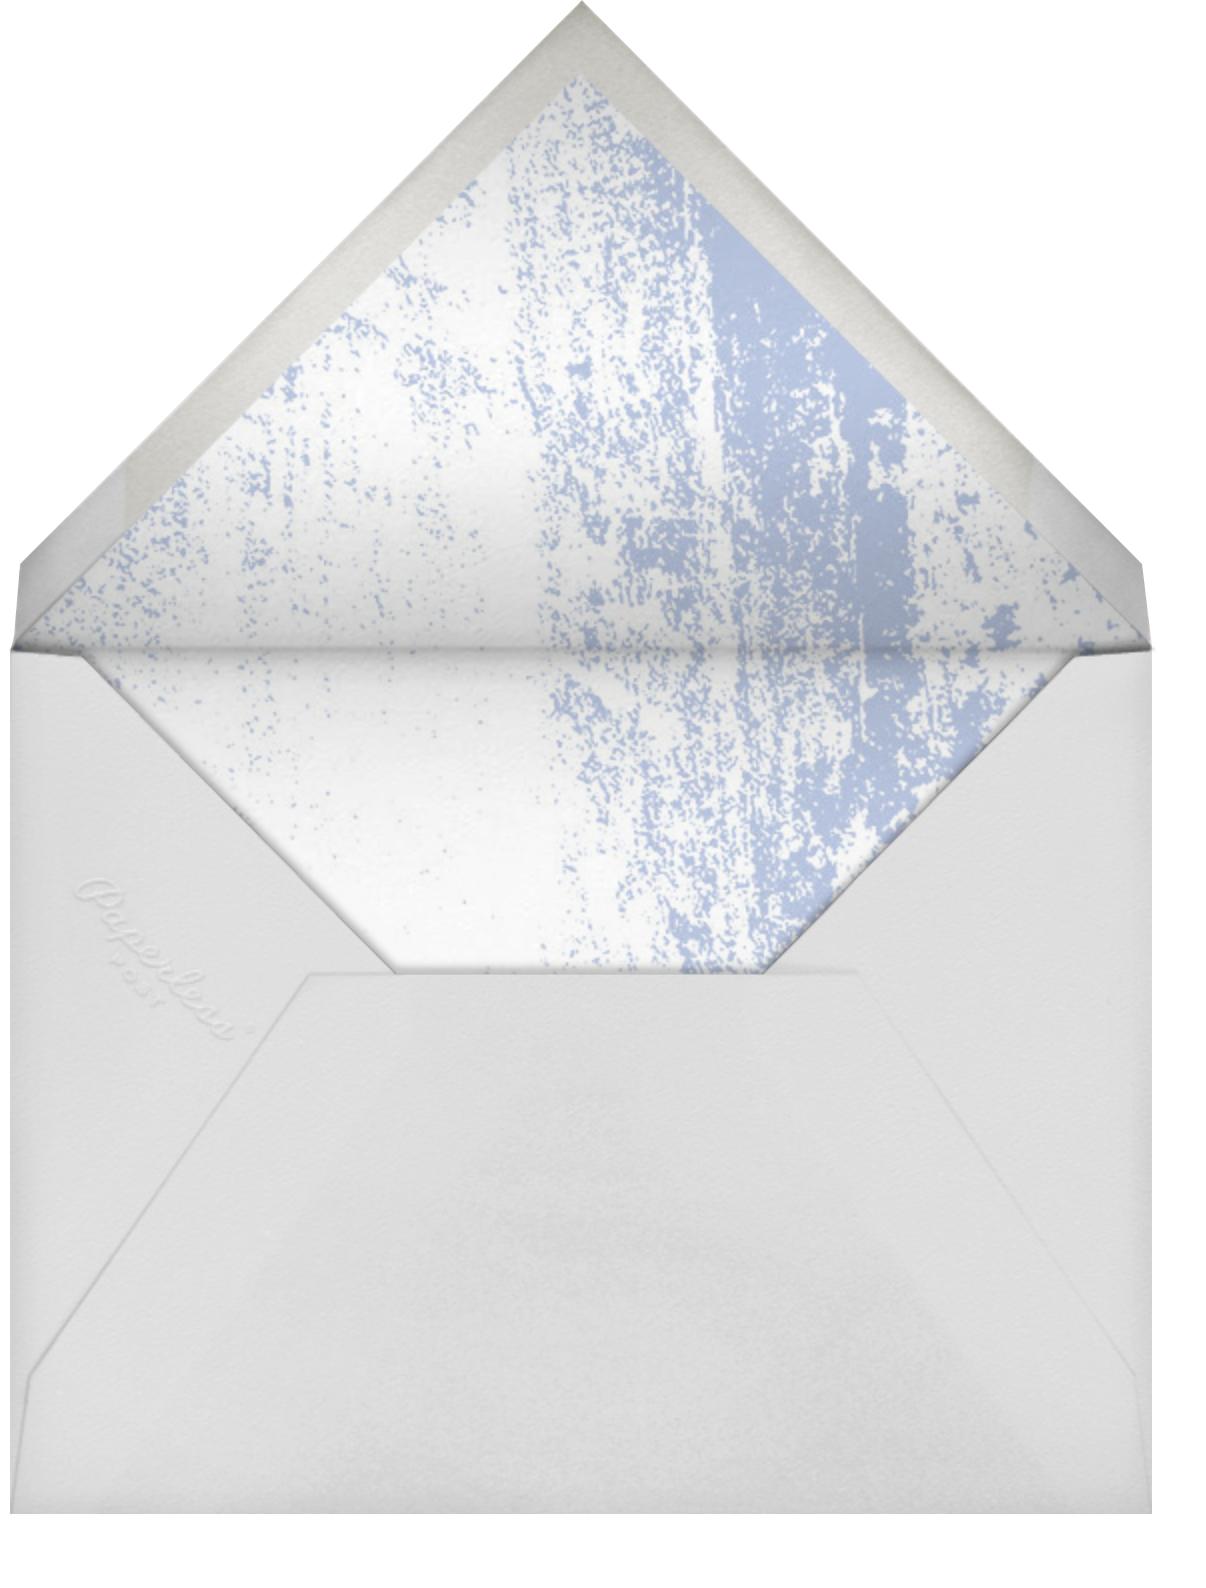 Aglow Stripe - Kelly Wearstler - Bridal shower - envelope back